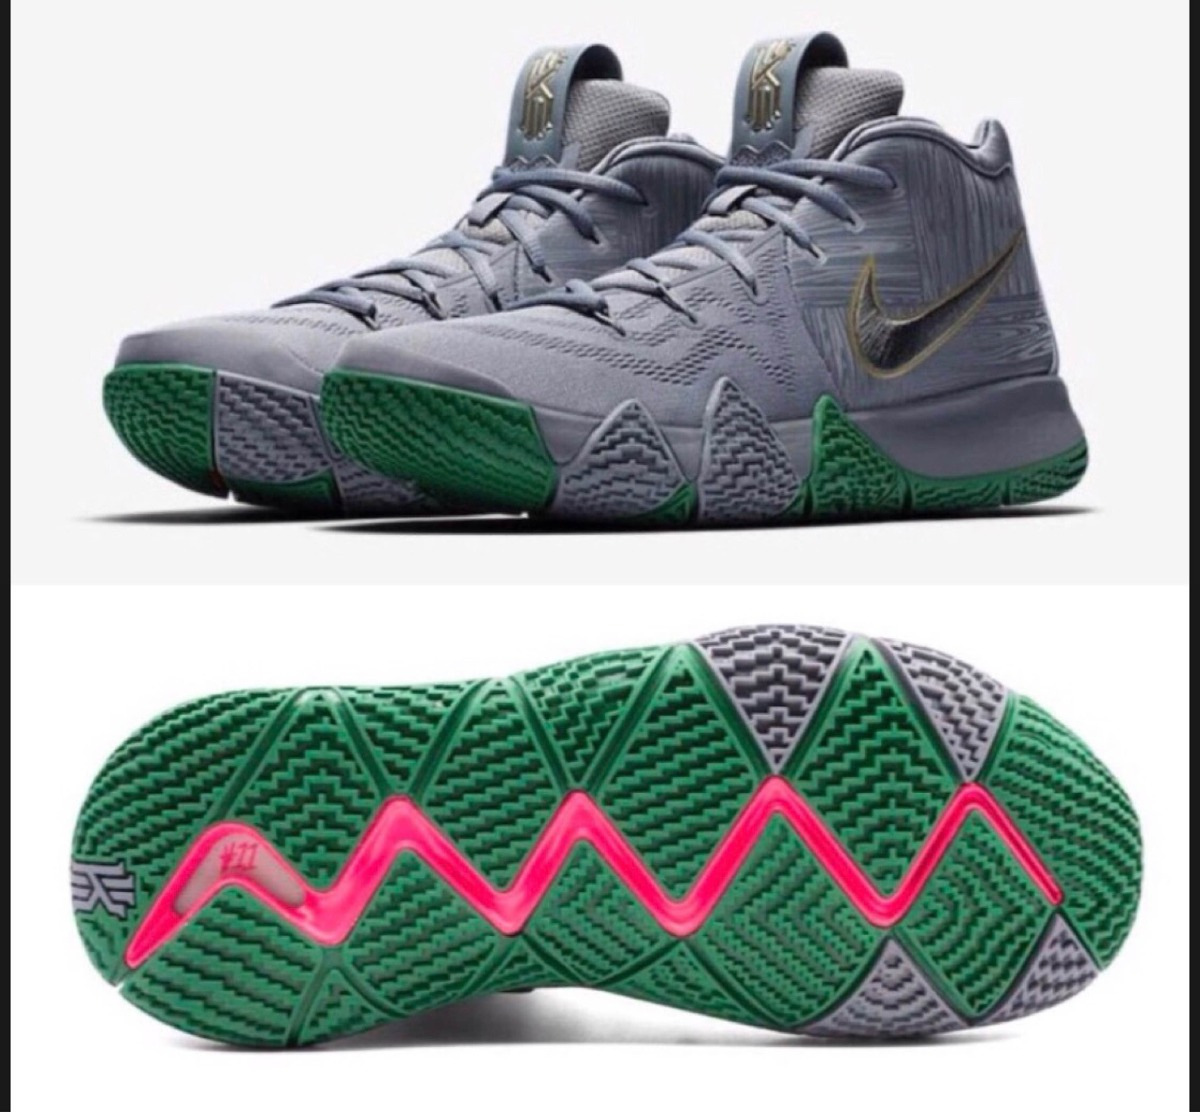 686712bb47d Basket Gratuito 398 Envió 00 Kyrie 2 Tenis 4 En Nike Irving 4H5qnwCwB